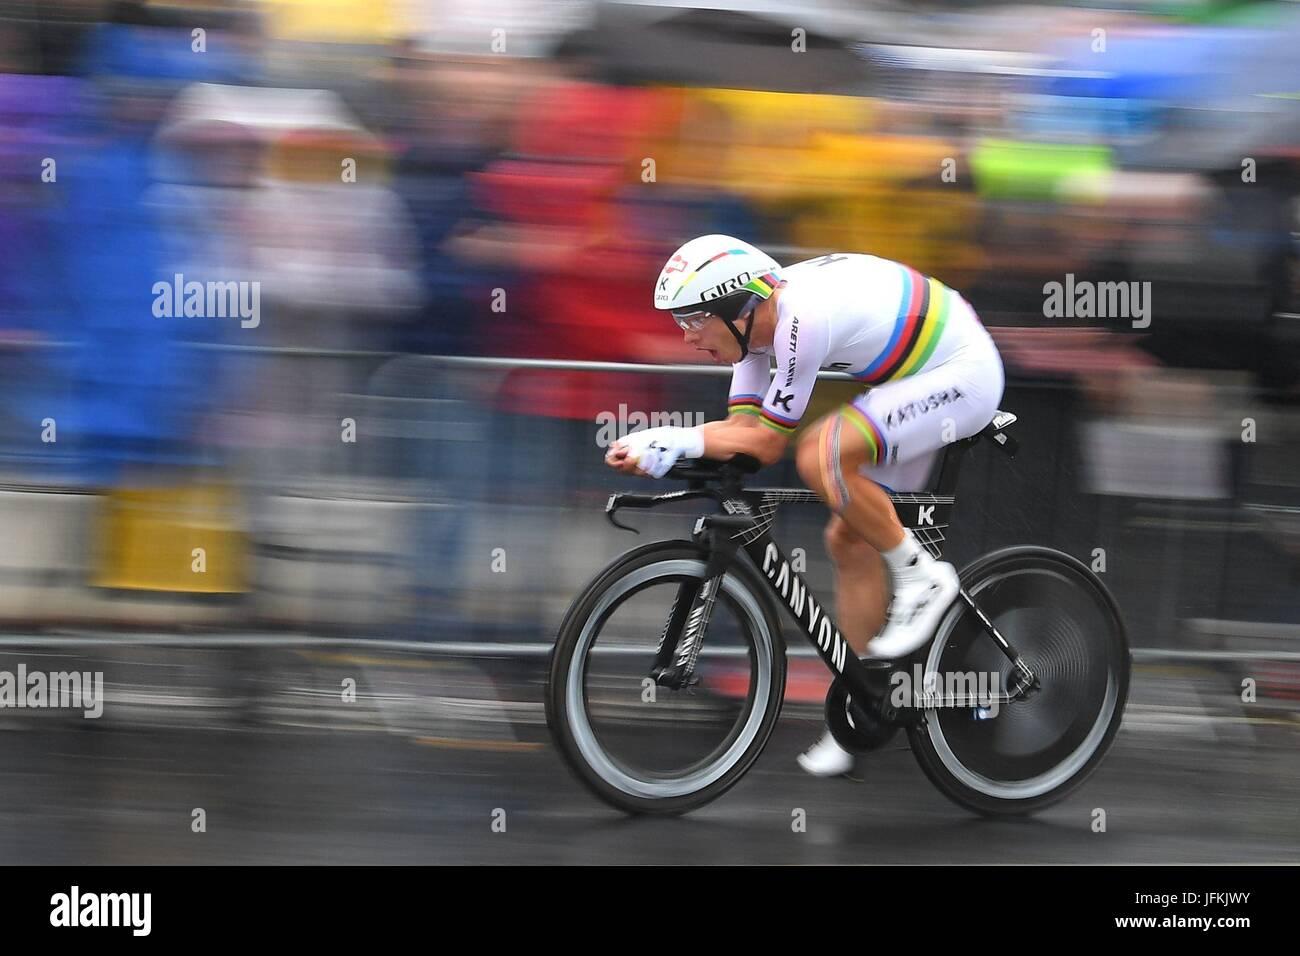 Düsseldorf, Nordrhein-Westfalen, Deutschland. 1. Juli 2017. ; Tony MARTIN (GER) Fahrer des Team Katusha - Alpecin Stockbild